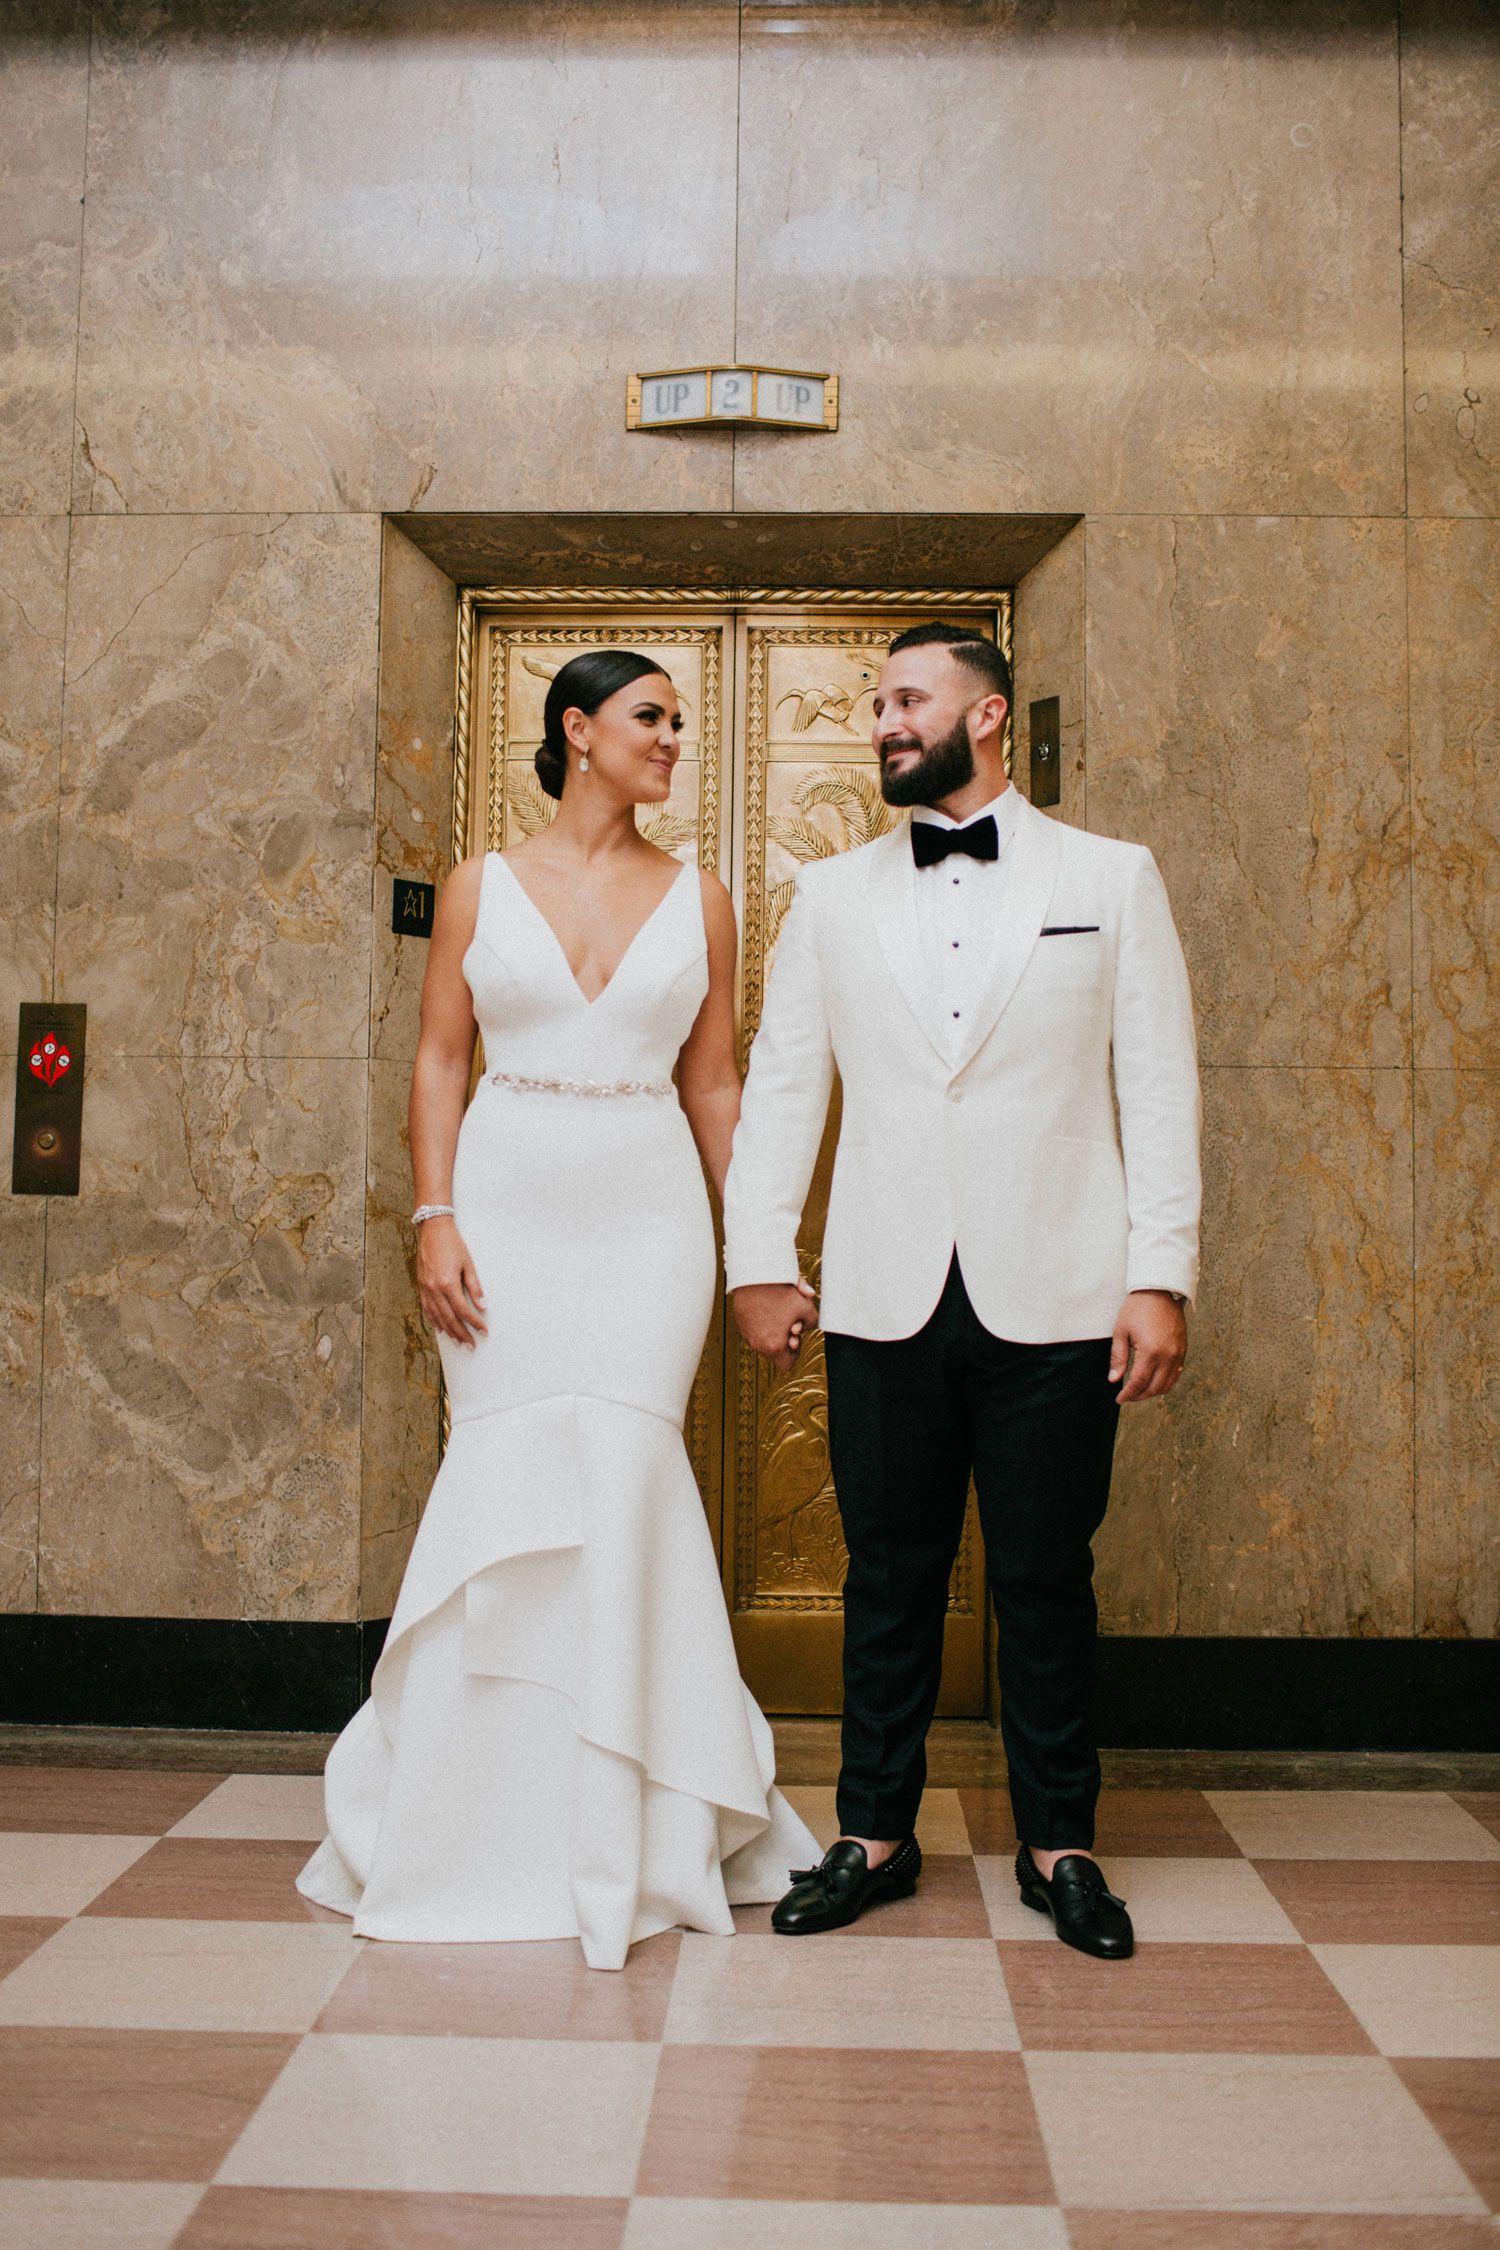 Elegant Modern Wedding With Emerald Color Palette In Miami Be Inspired Pr Elegant Modern Wedding Wedding Modern Wedding Inside [ 2250 x 1500 Pixel ]